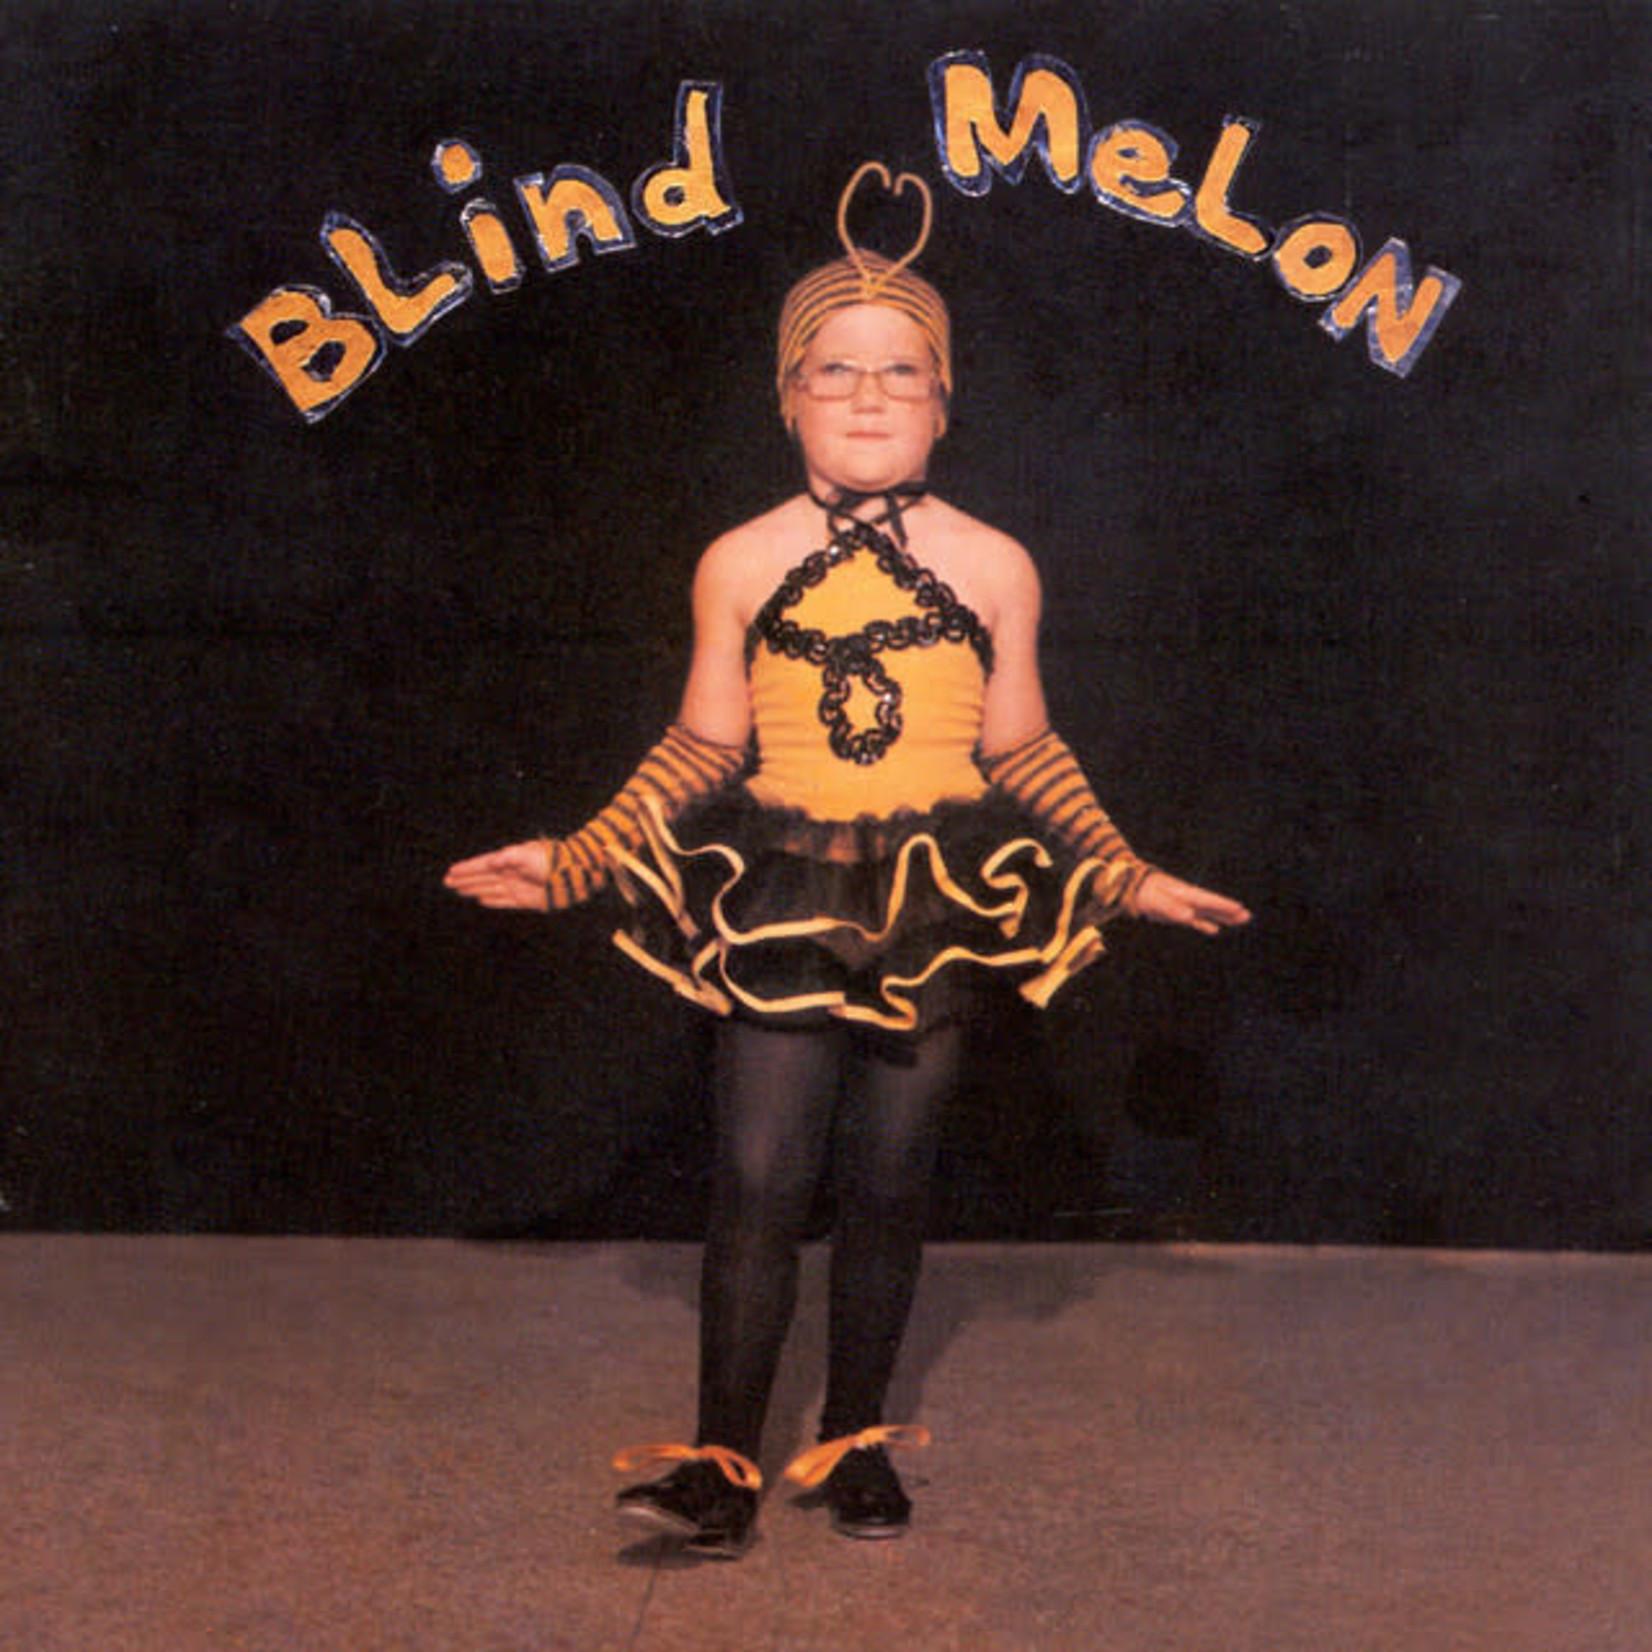 Vinyl Blind Melon - S/T